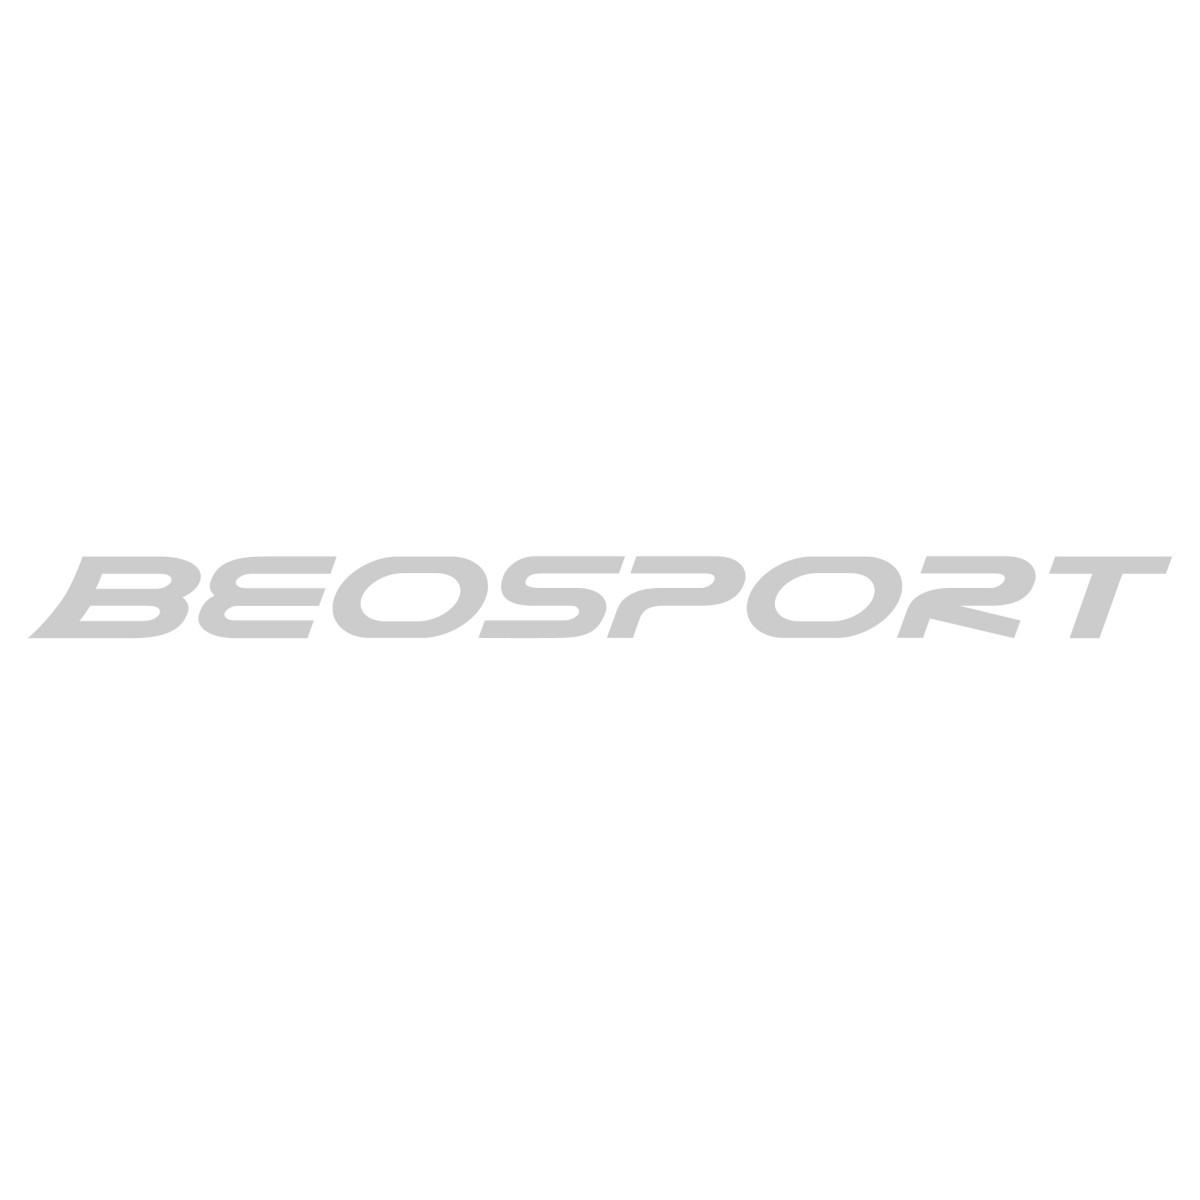 NGN Windproof Stripes fantomka